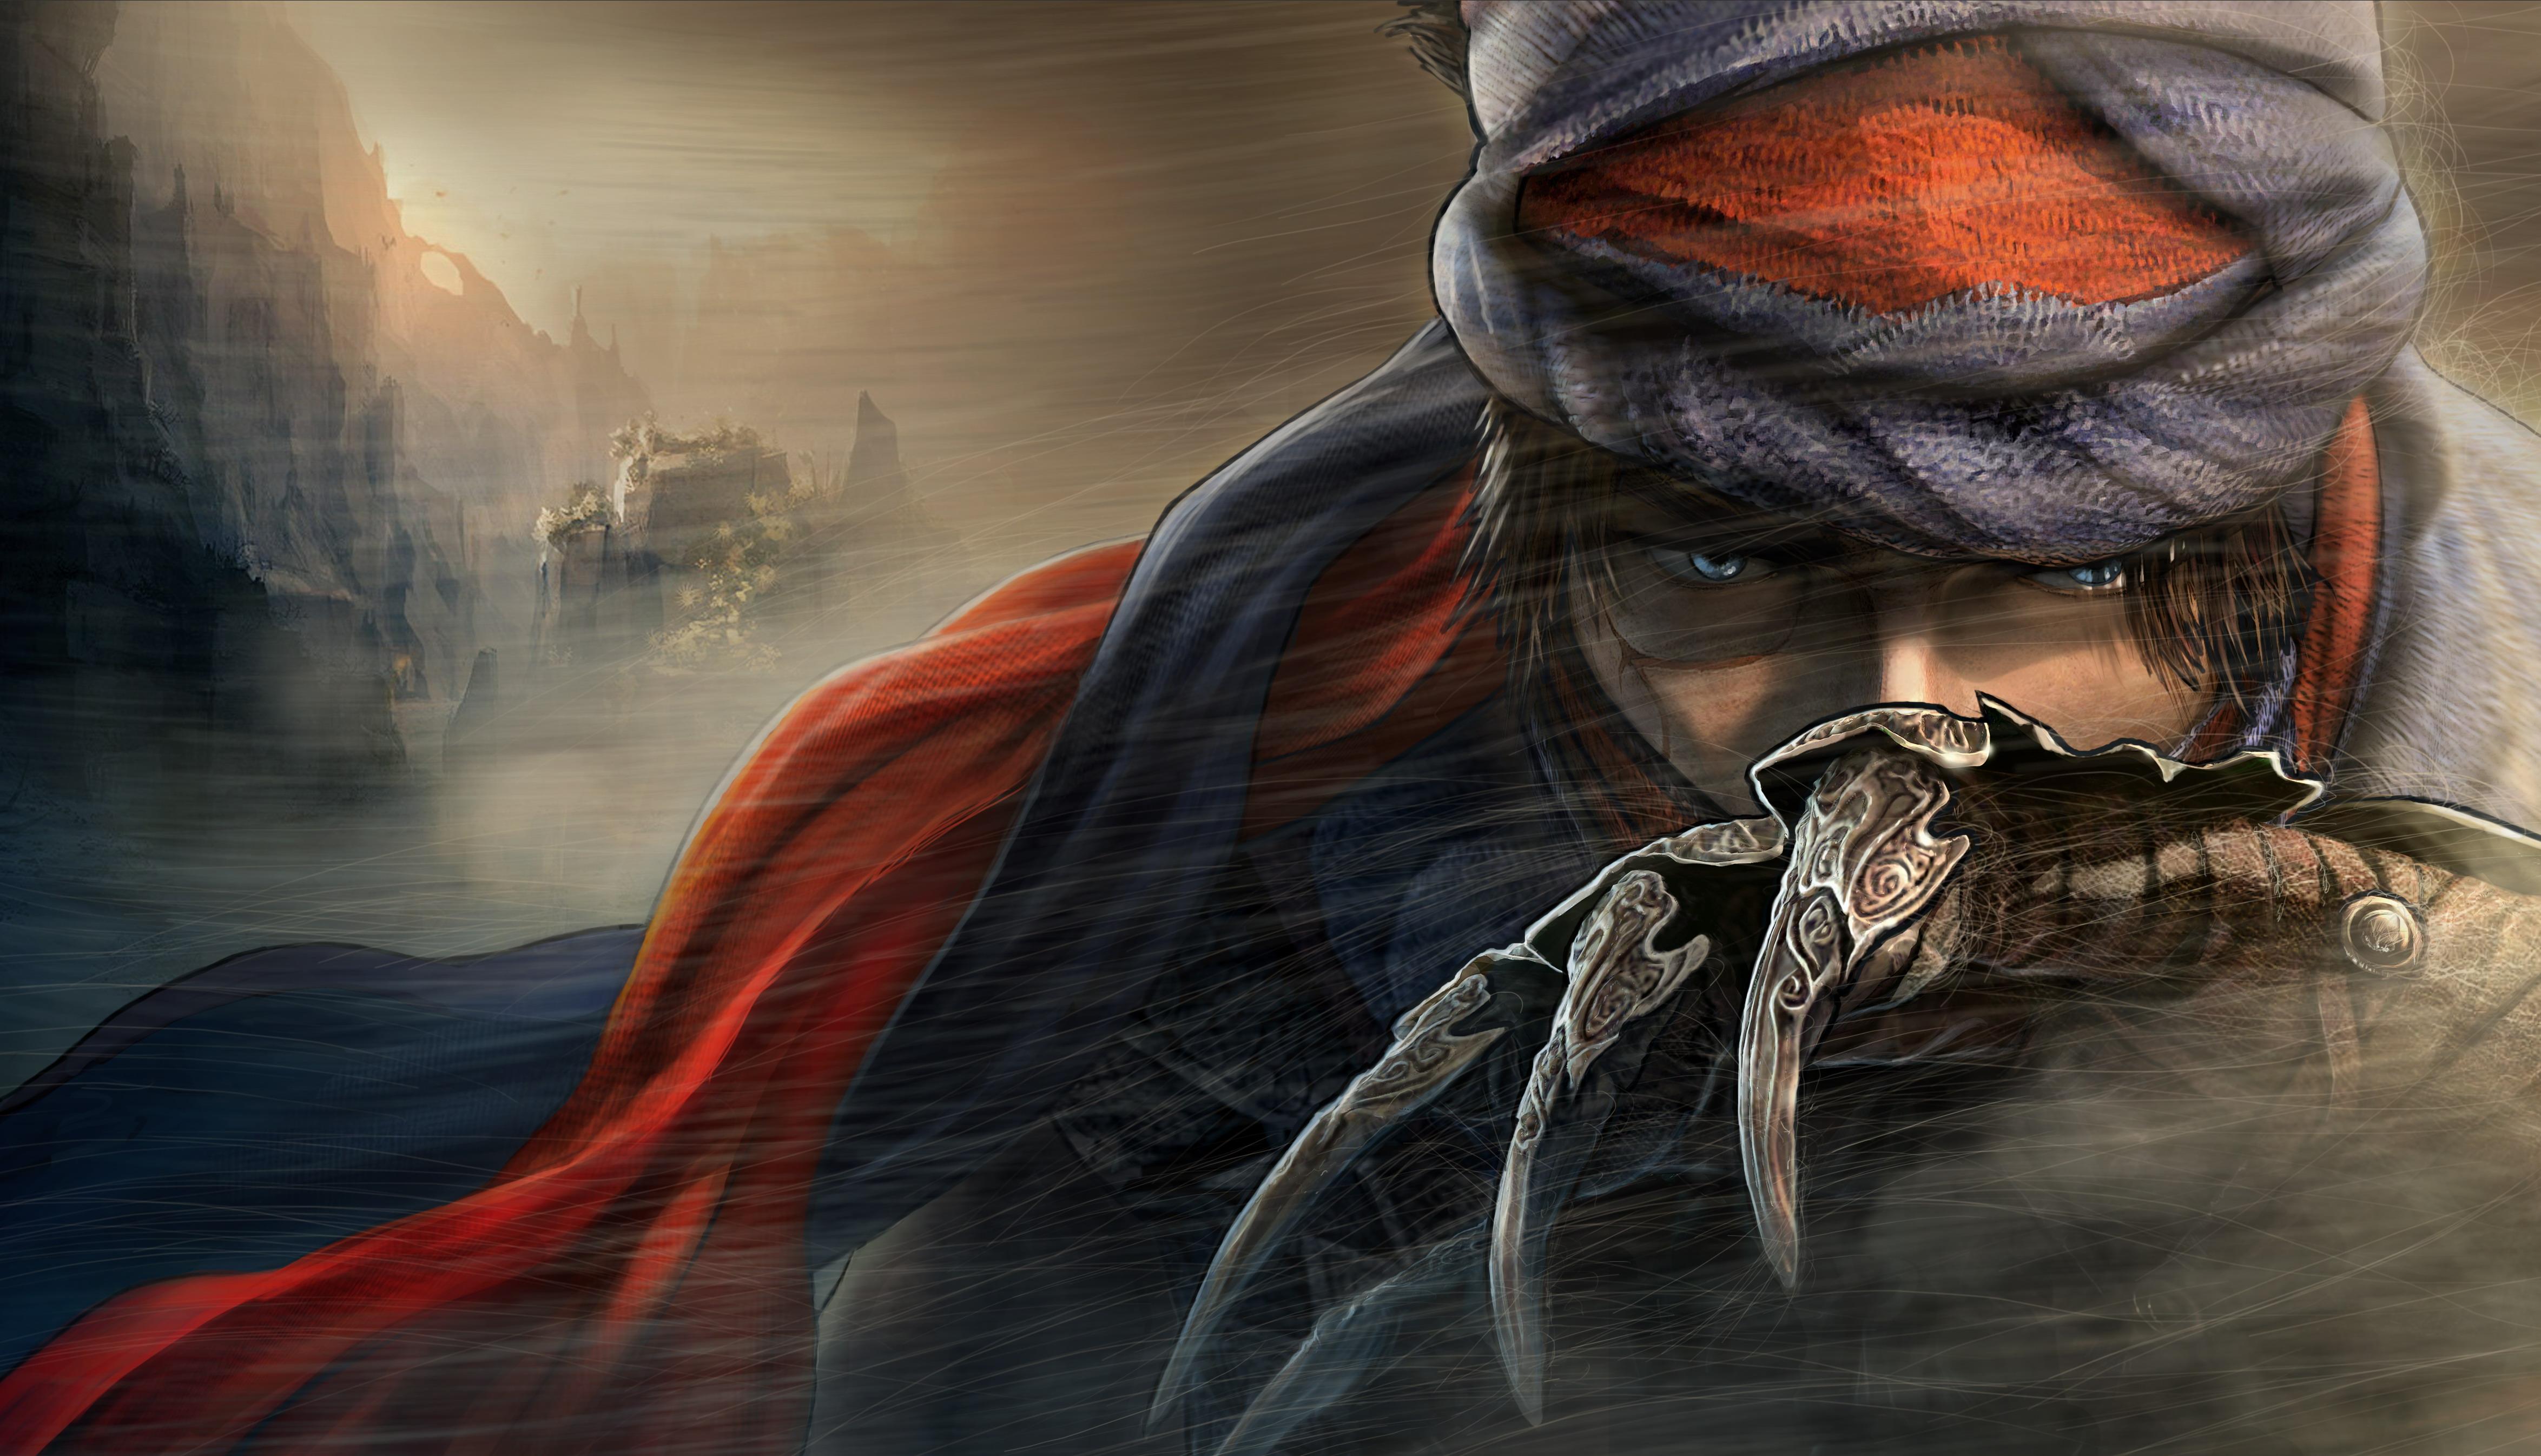 Prince Of Persia 4k Ultra HD Wallpaper